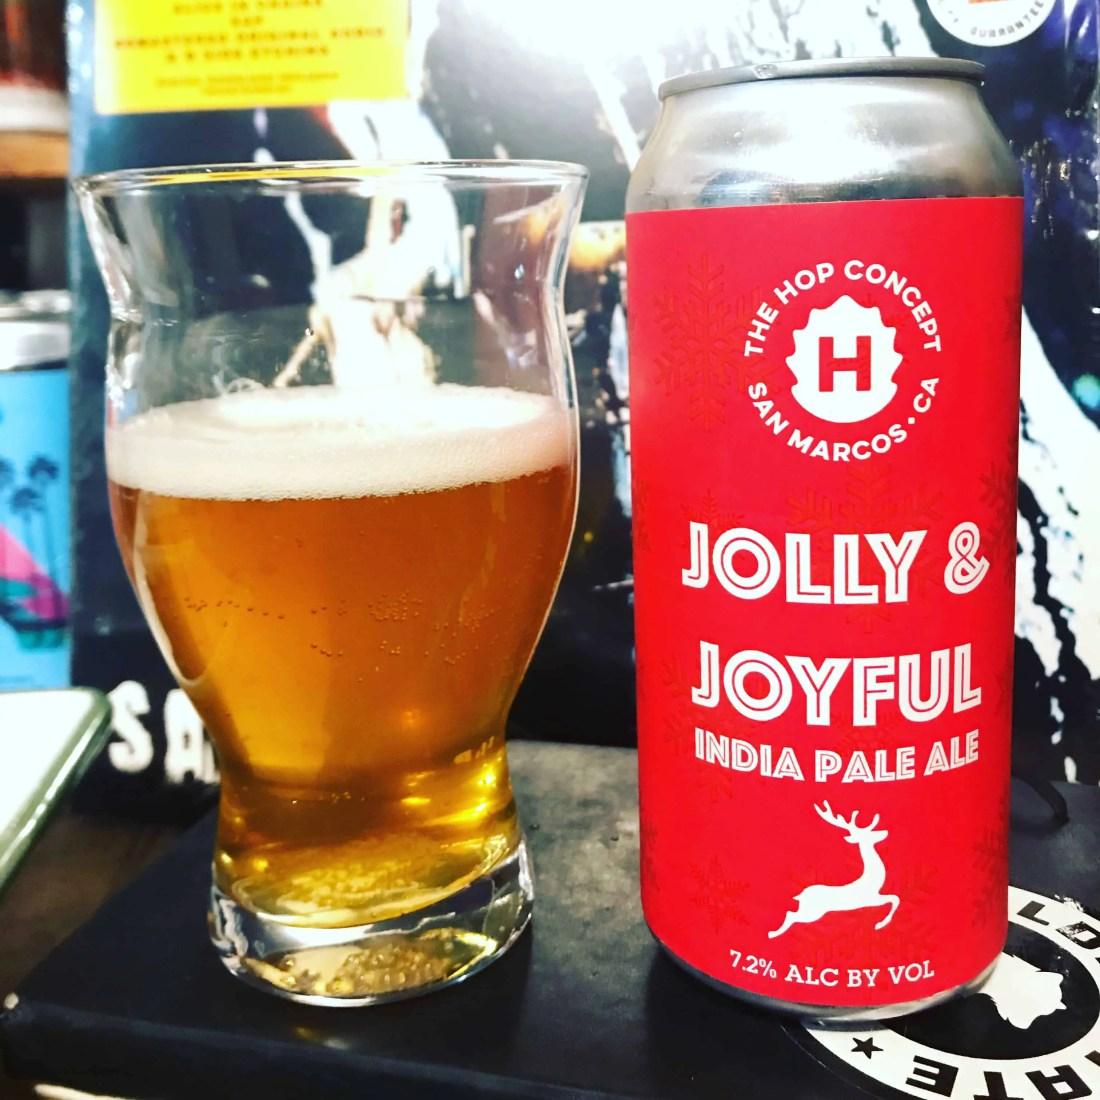 Jolly & Joyfull IPA, Christmas Beer